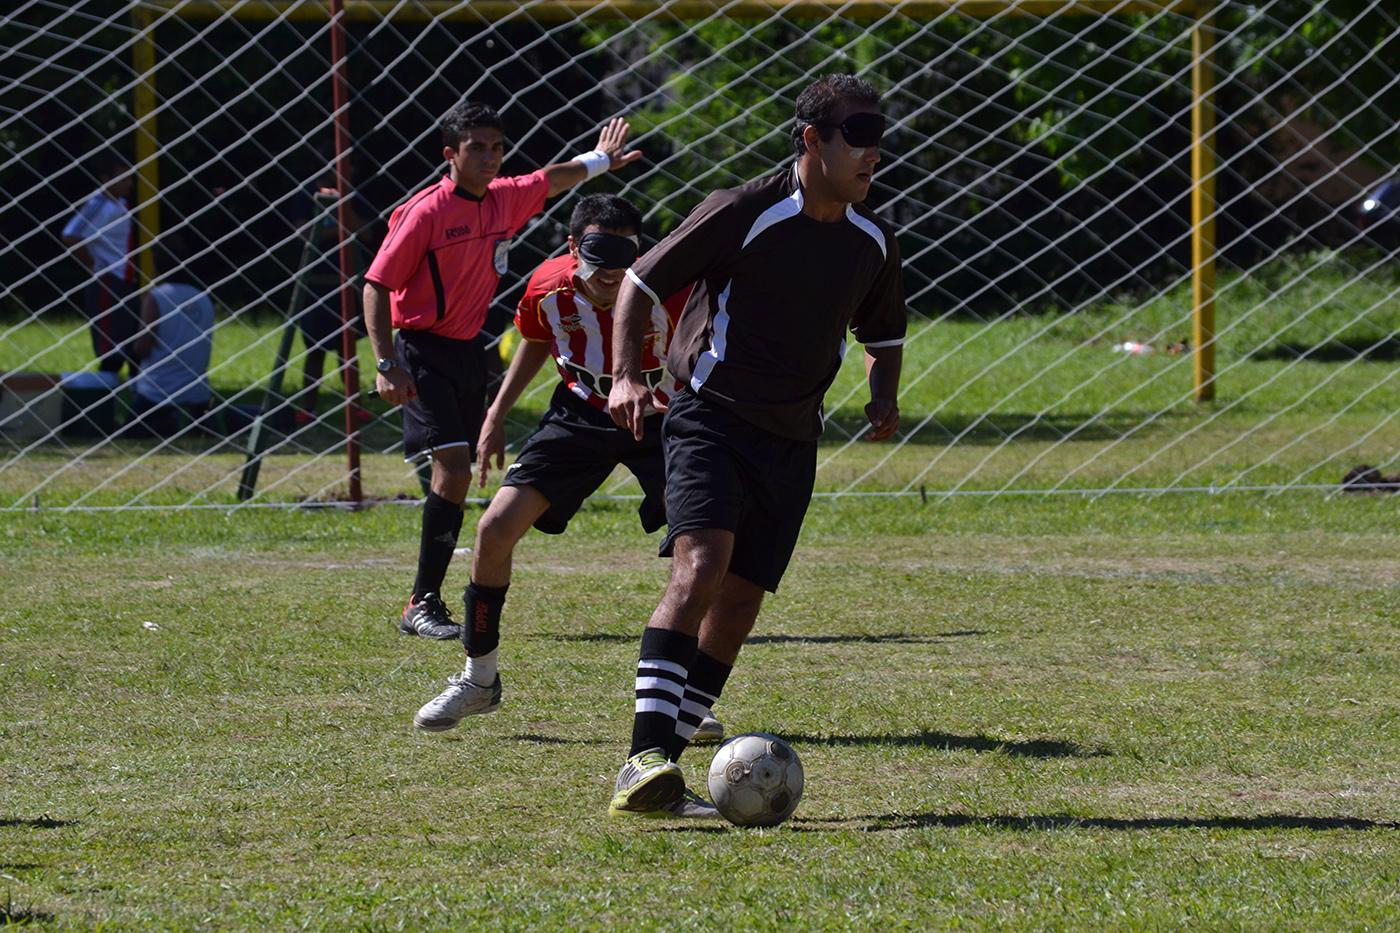 futbol_para_ciegos